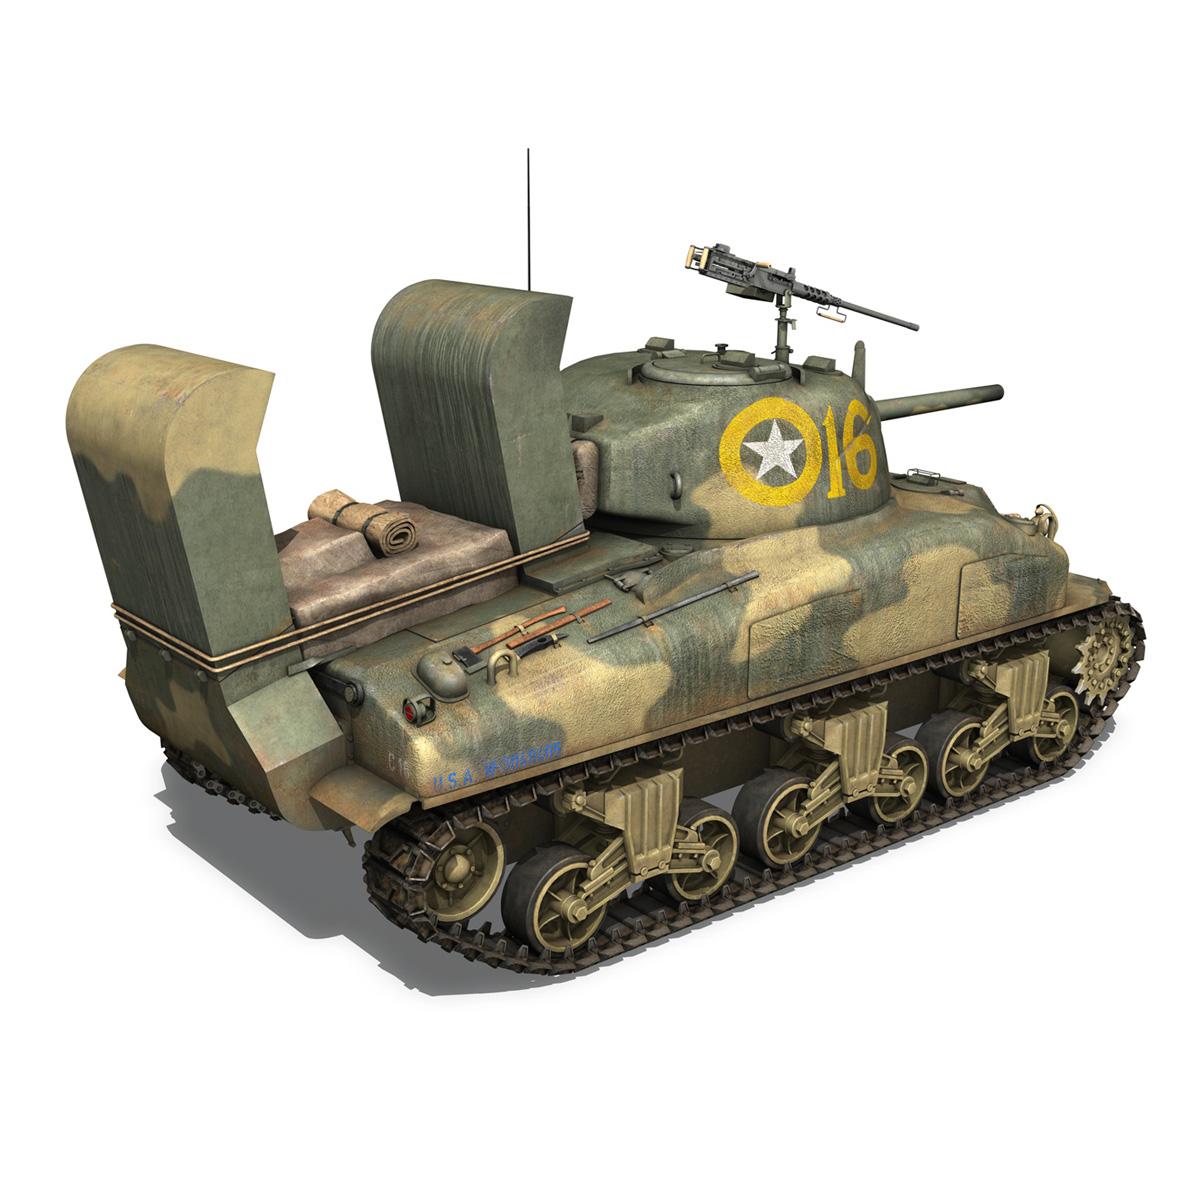 M4A1 Sherman - 16 3d model 3ds fbx c4d lwo lws lw obj 273055